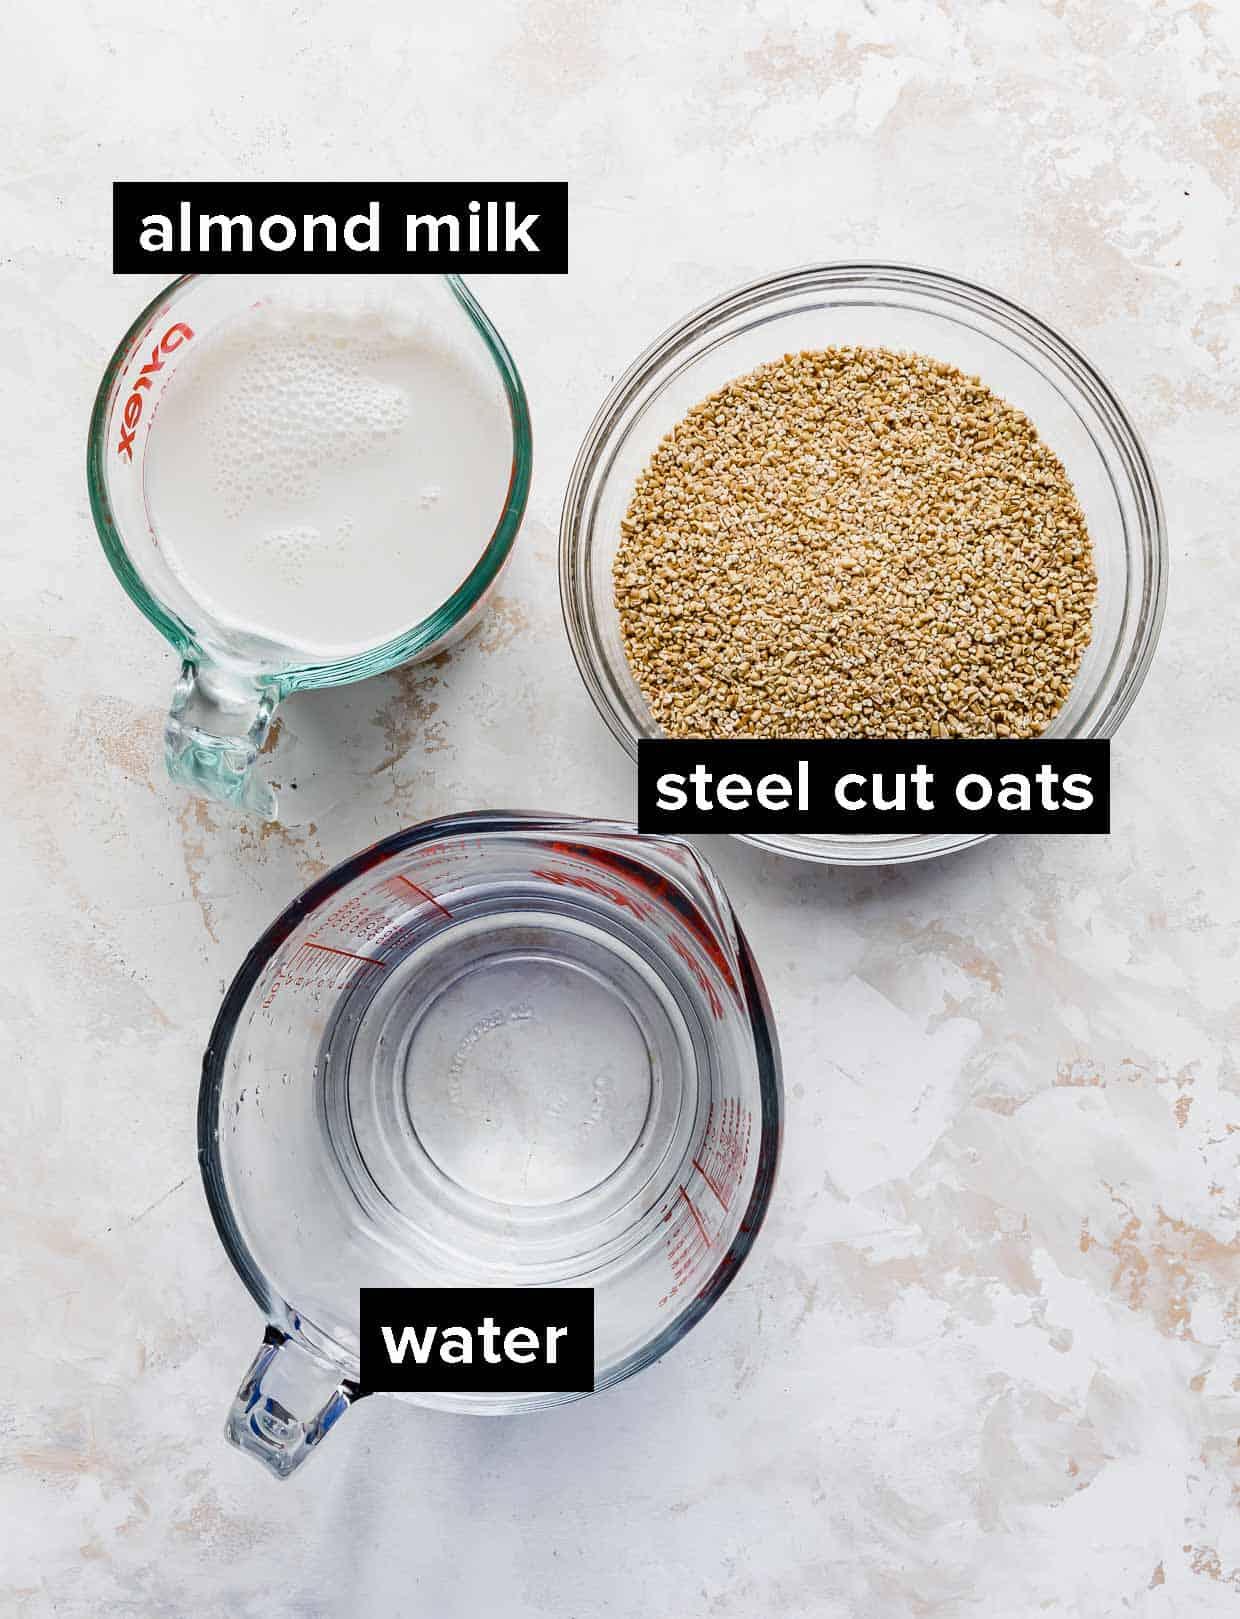 Ingredients used to make steel cut oats; water, almond milk, and steel cut oats.